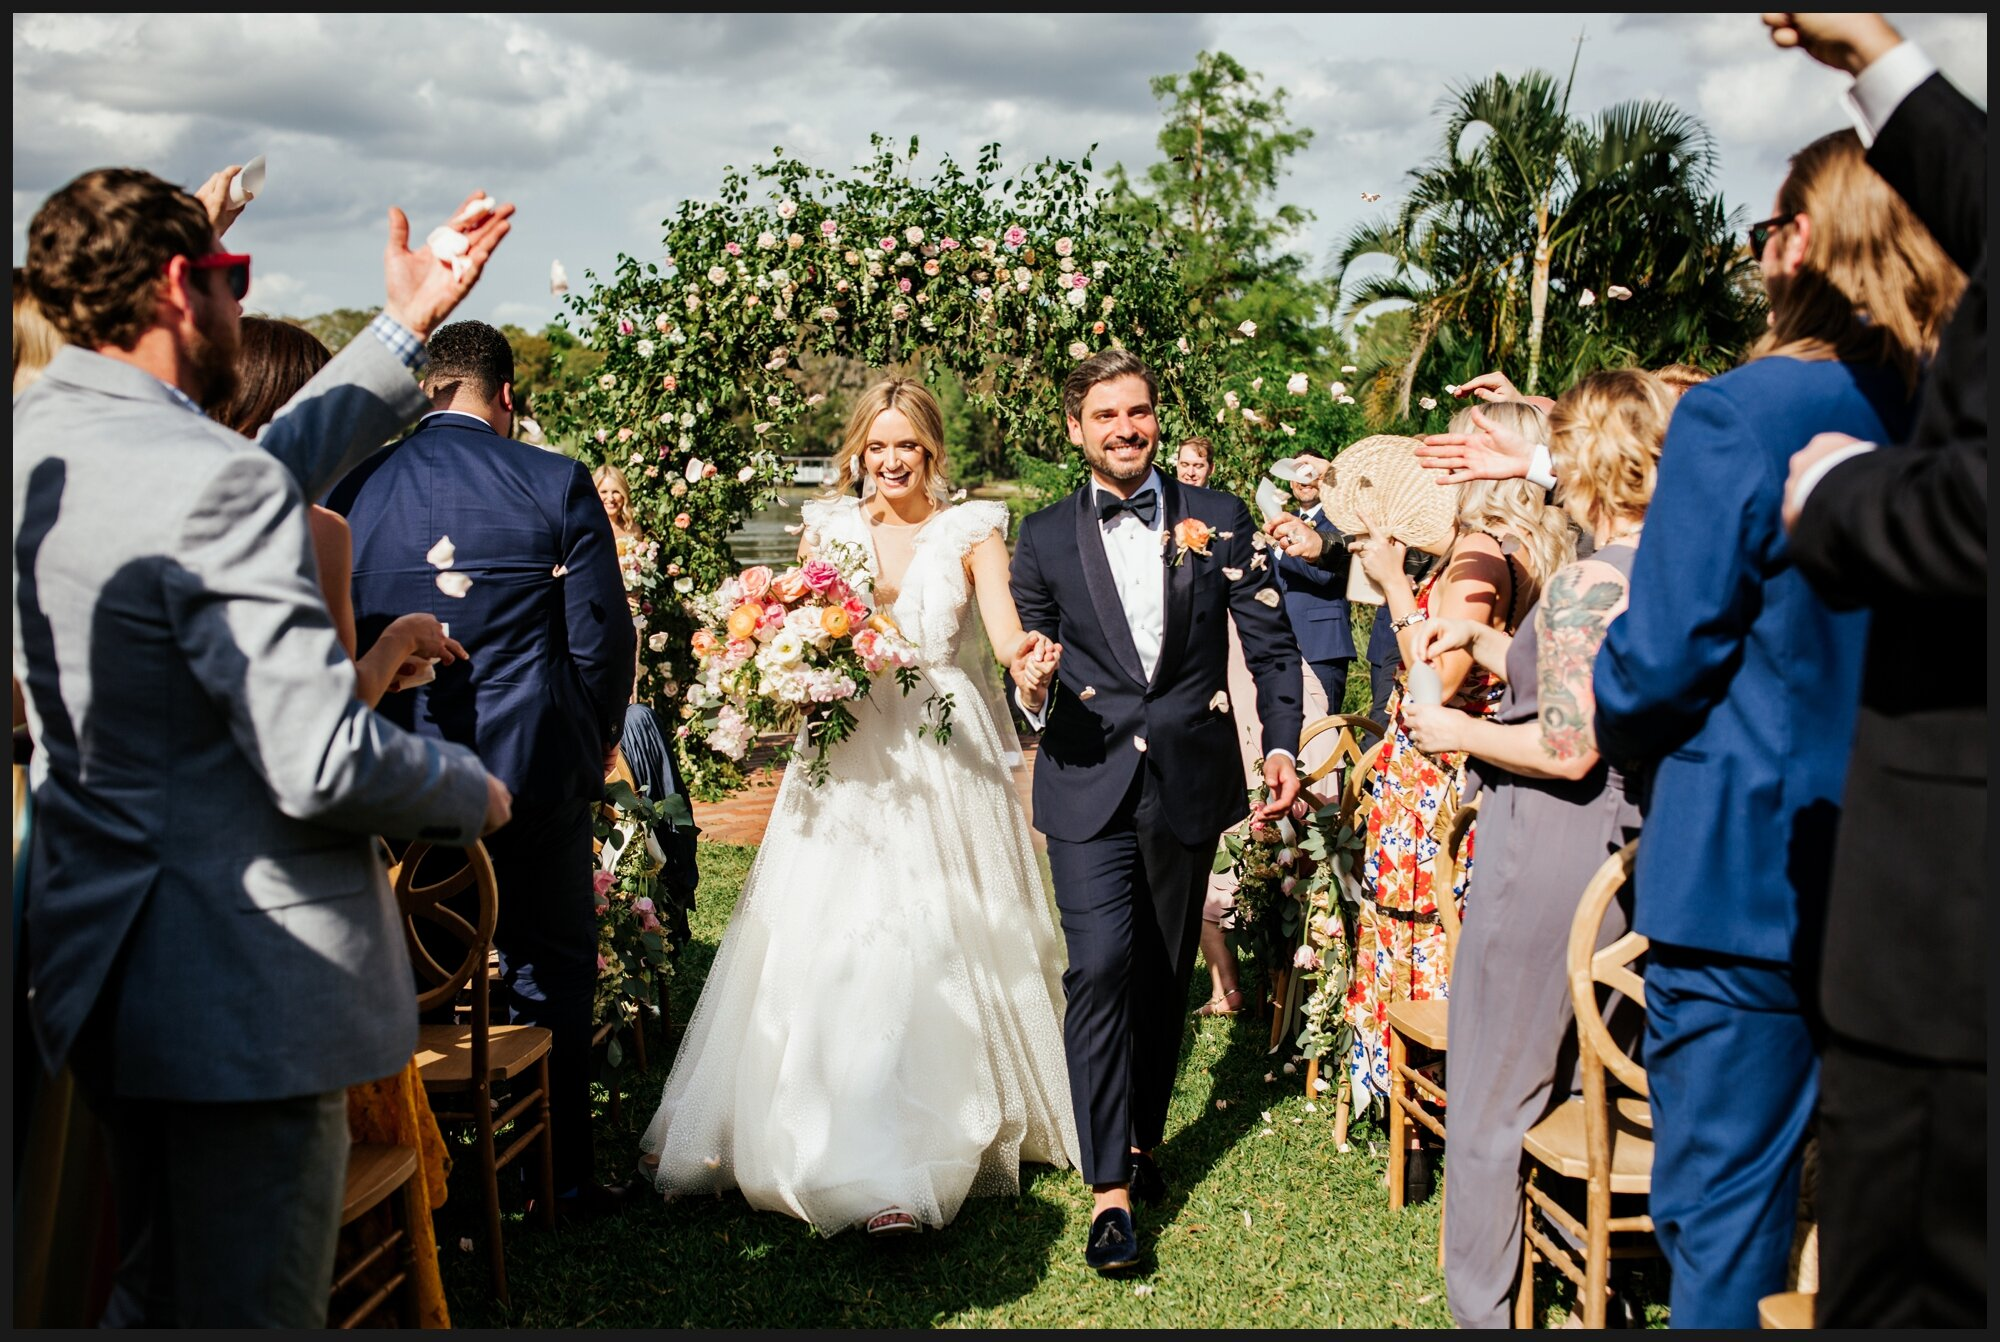 Orlando-Wedding-Photographer-destination-wedding-photographer-florida-wedding-photographer-hawaii-wedding-photographer_0756.jpg